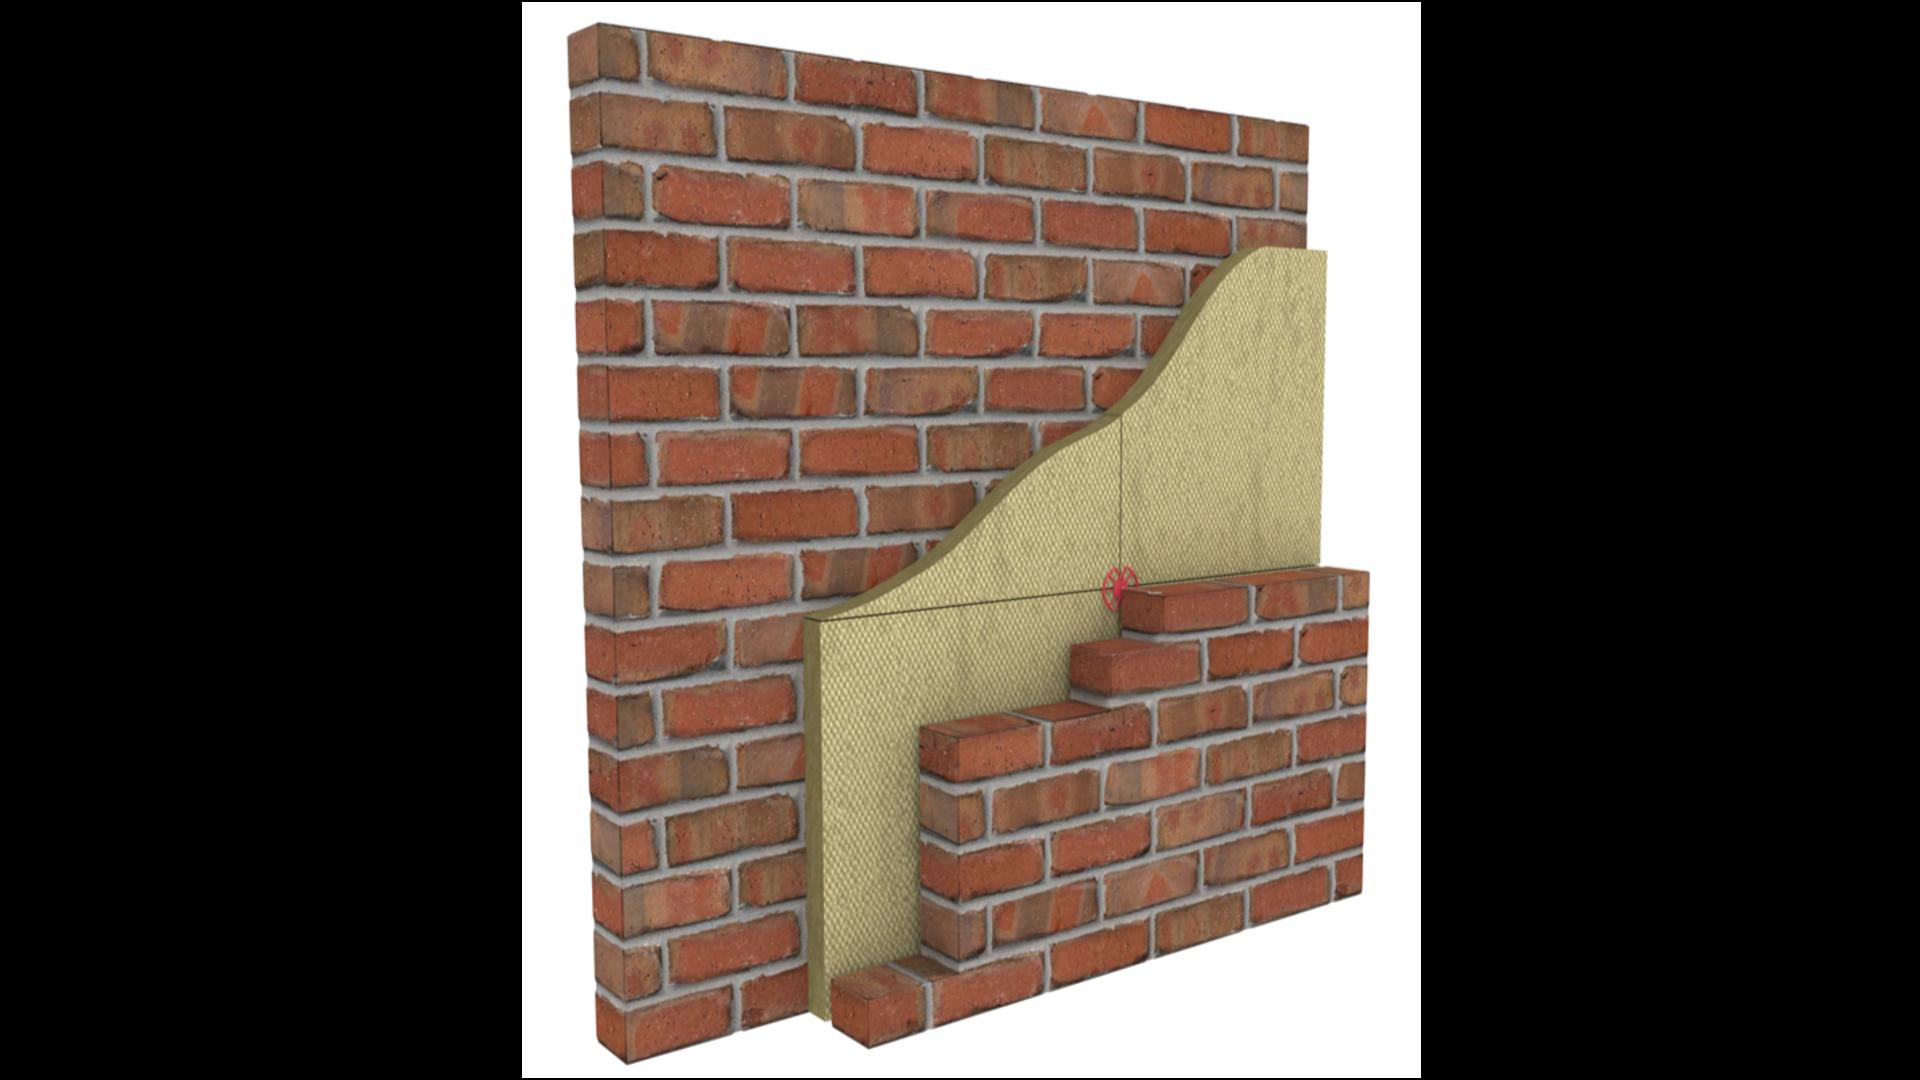 Application, BIM, Wall